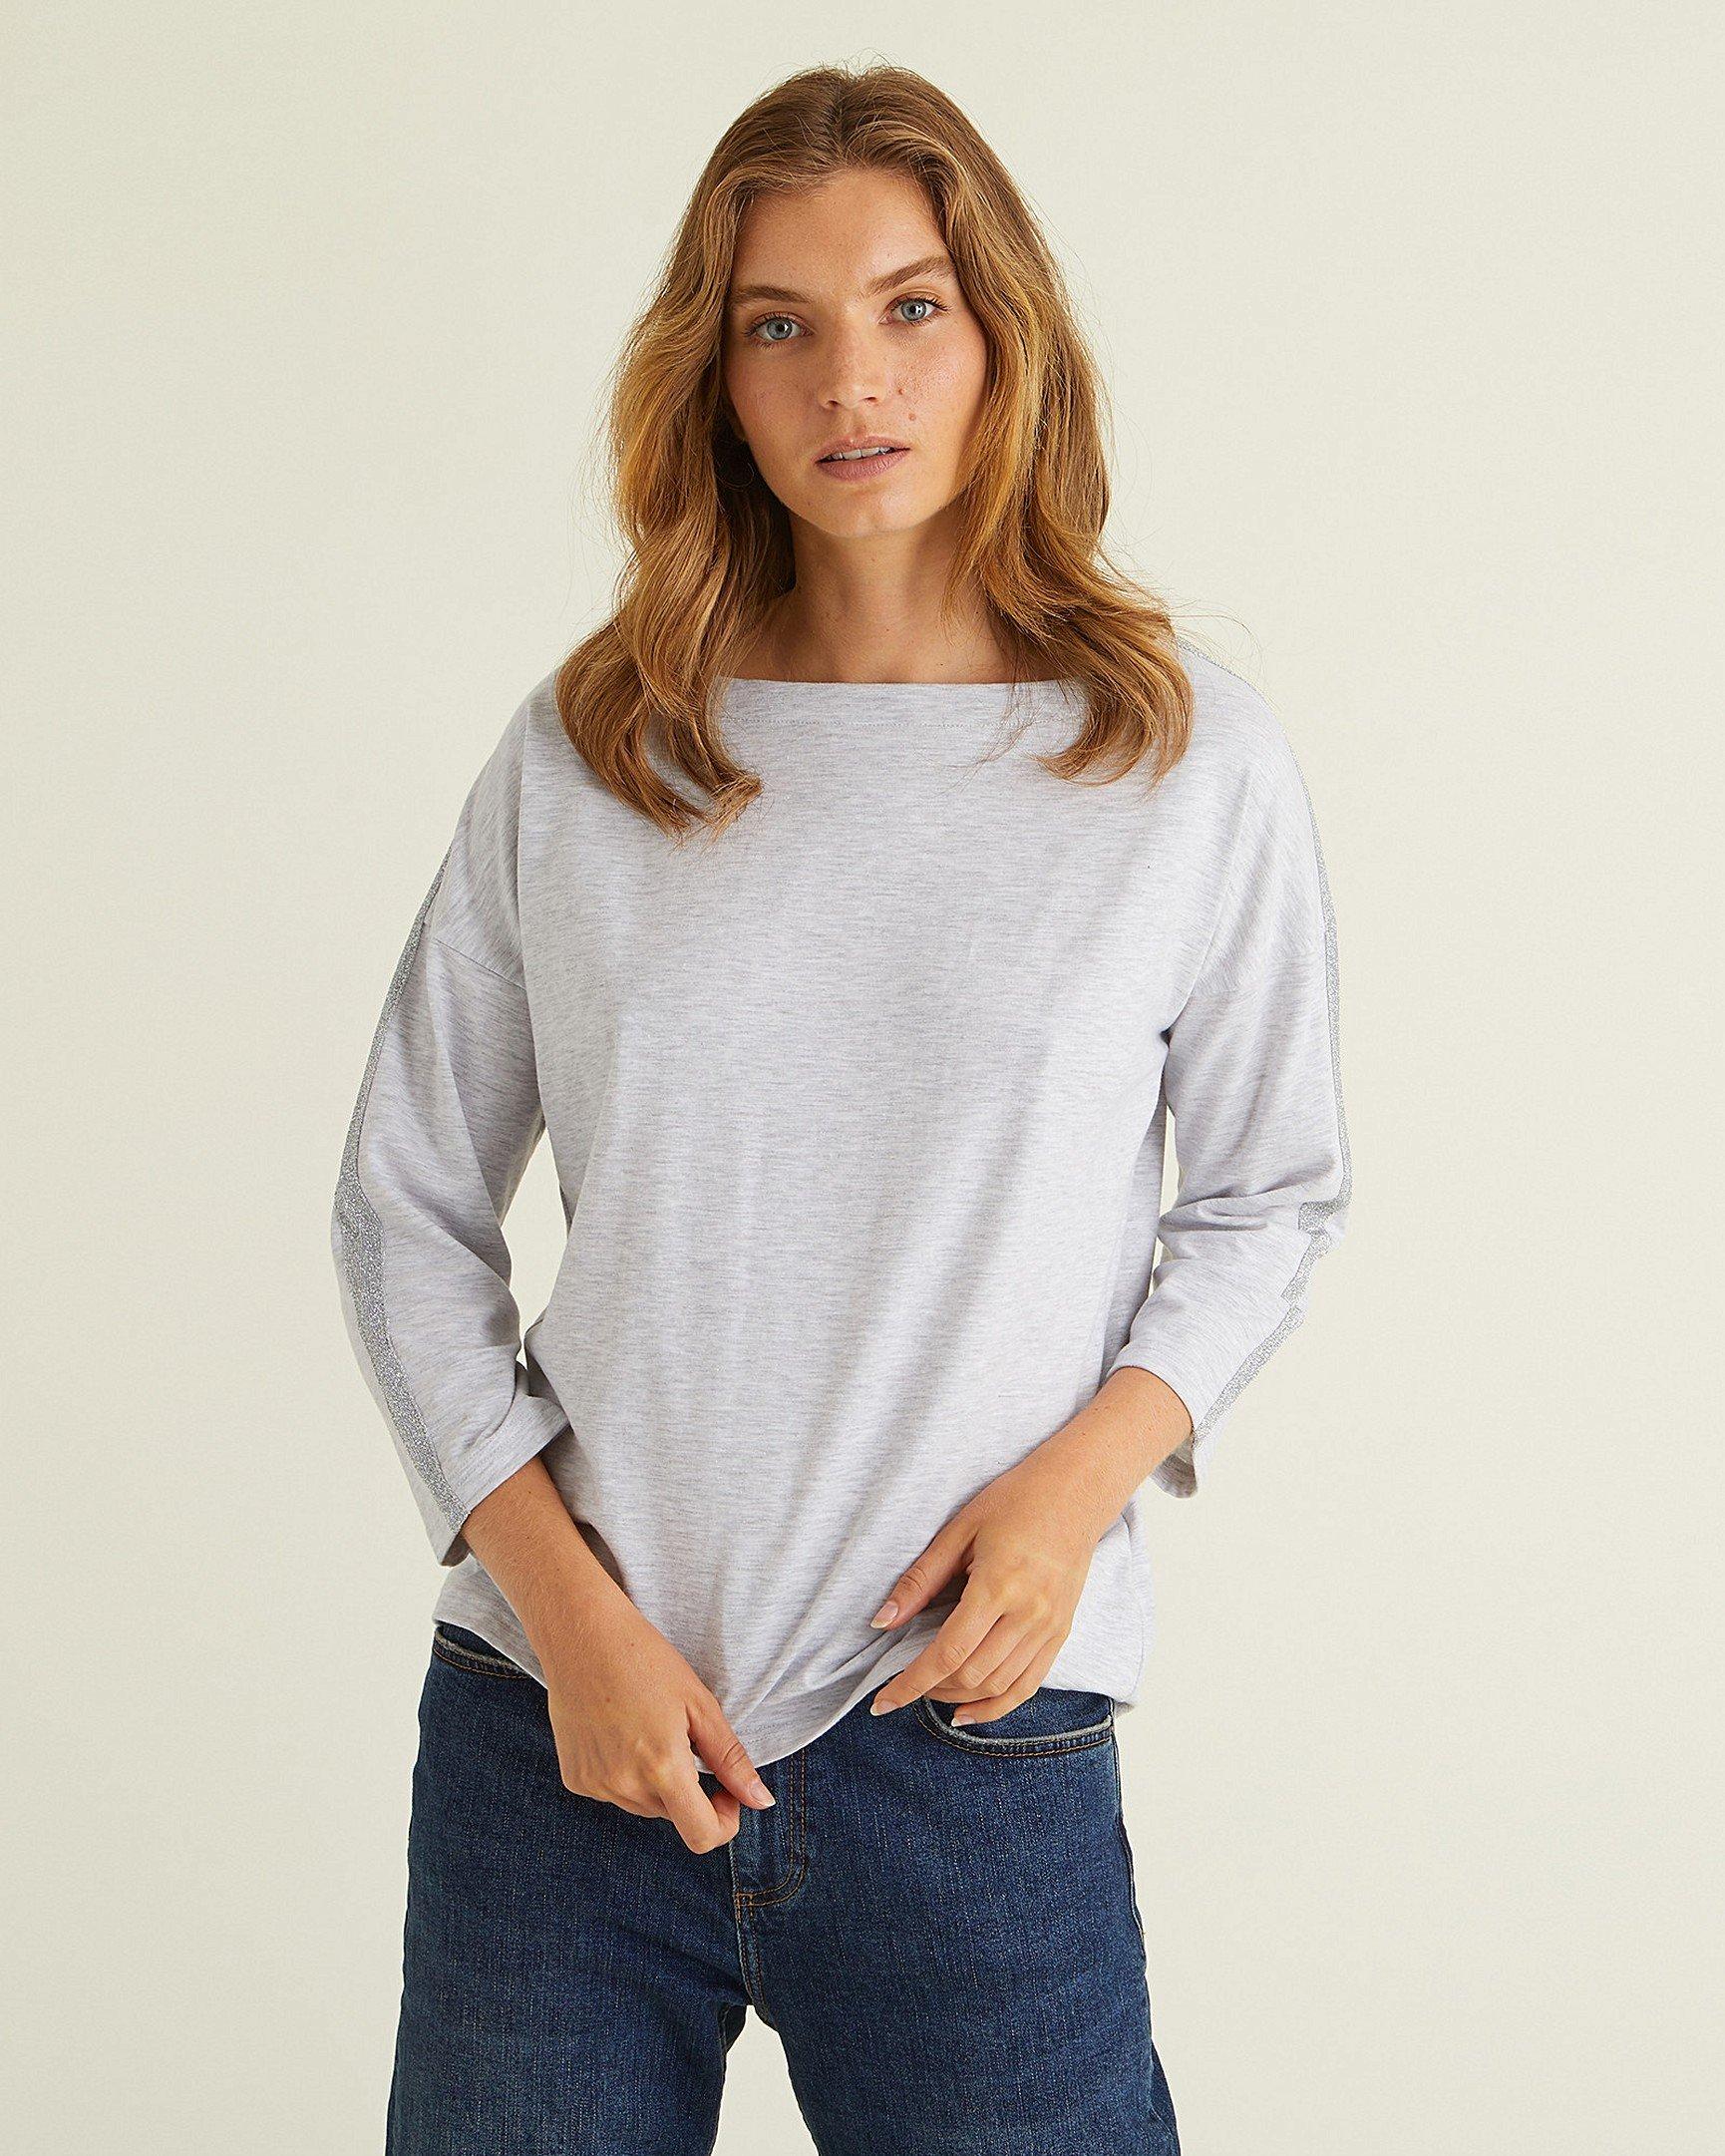 eeaabbc87 Tops | Blouses, Shirts & Tops for Women | Oliver Bonas